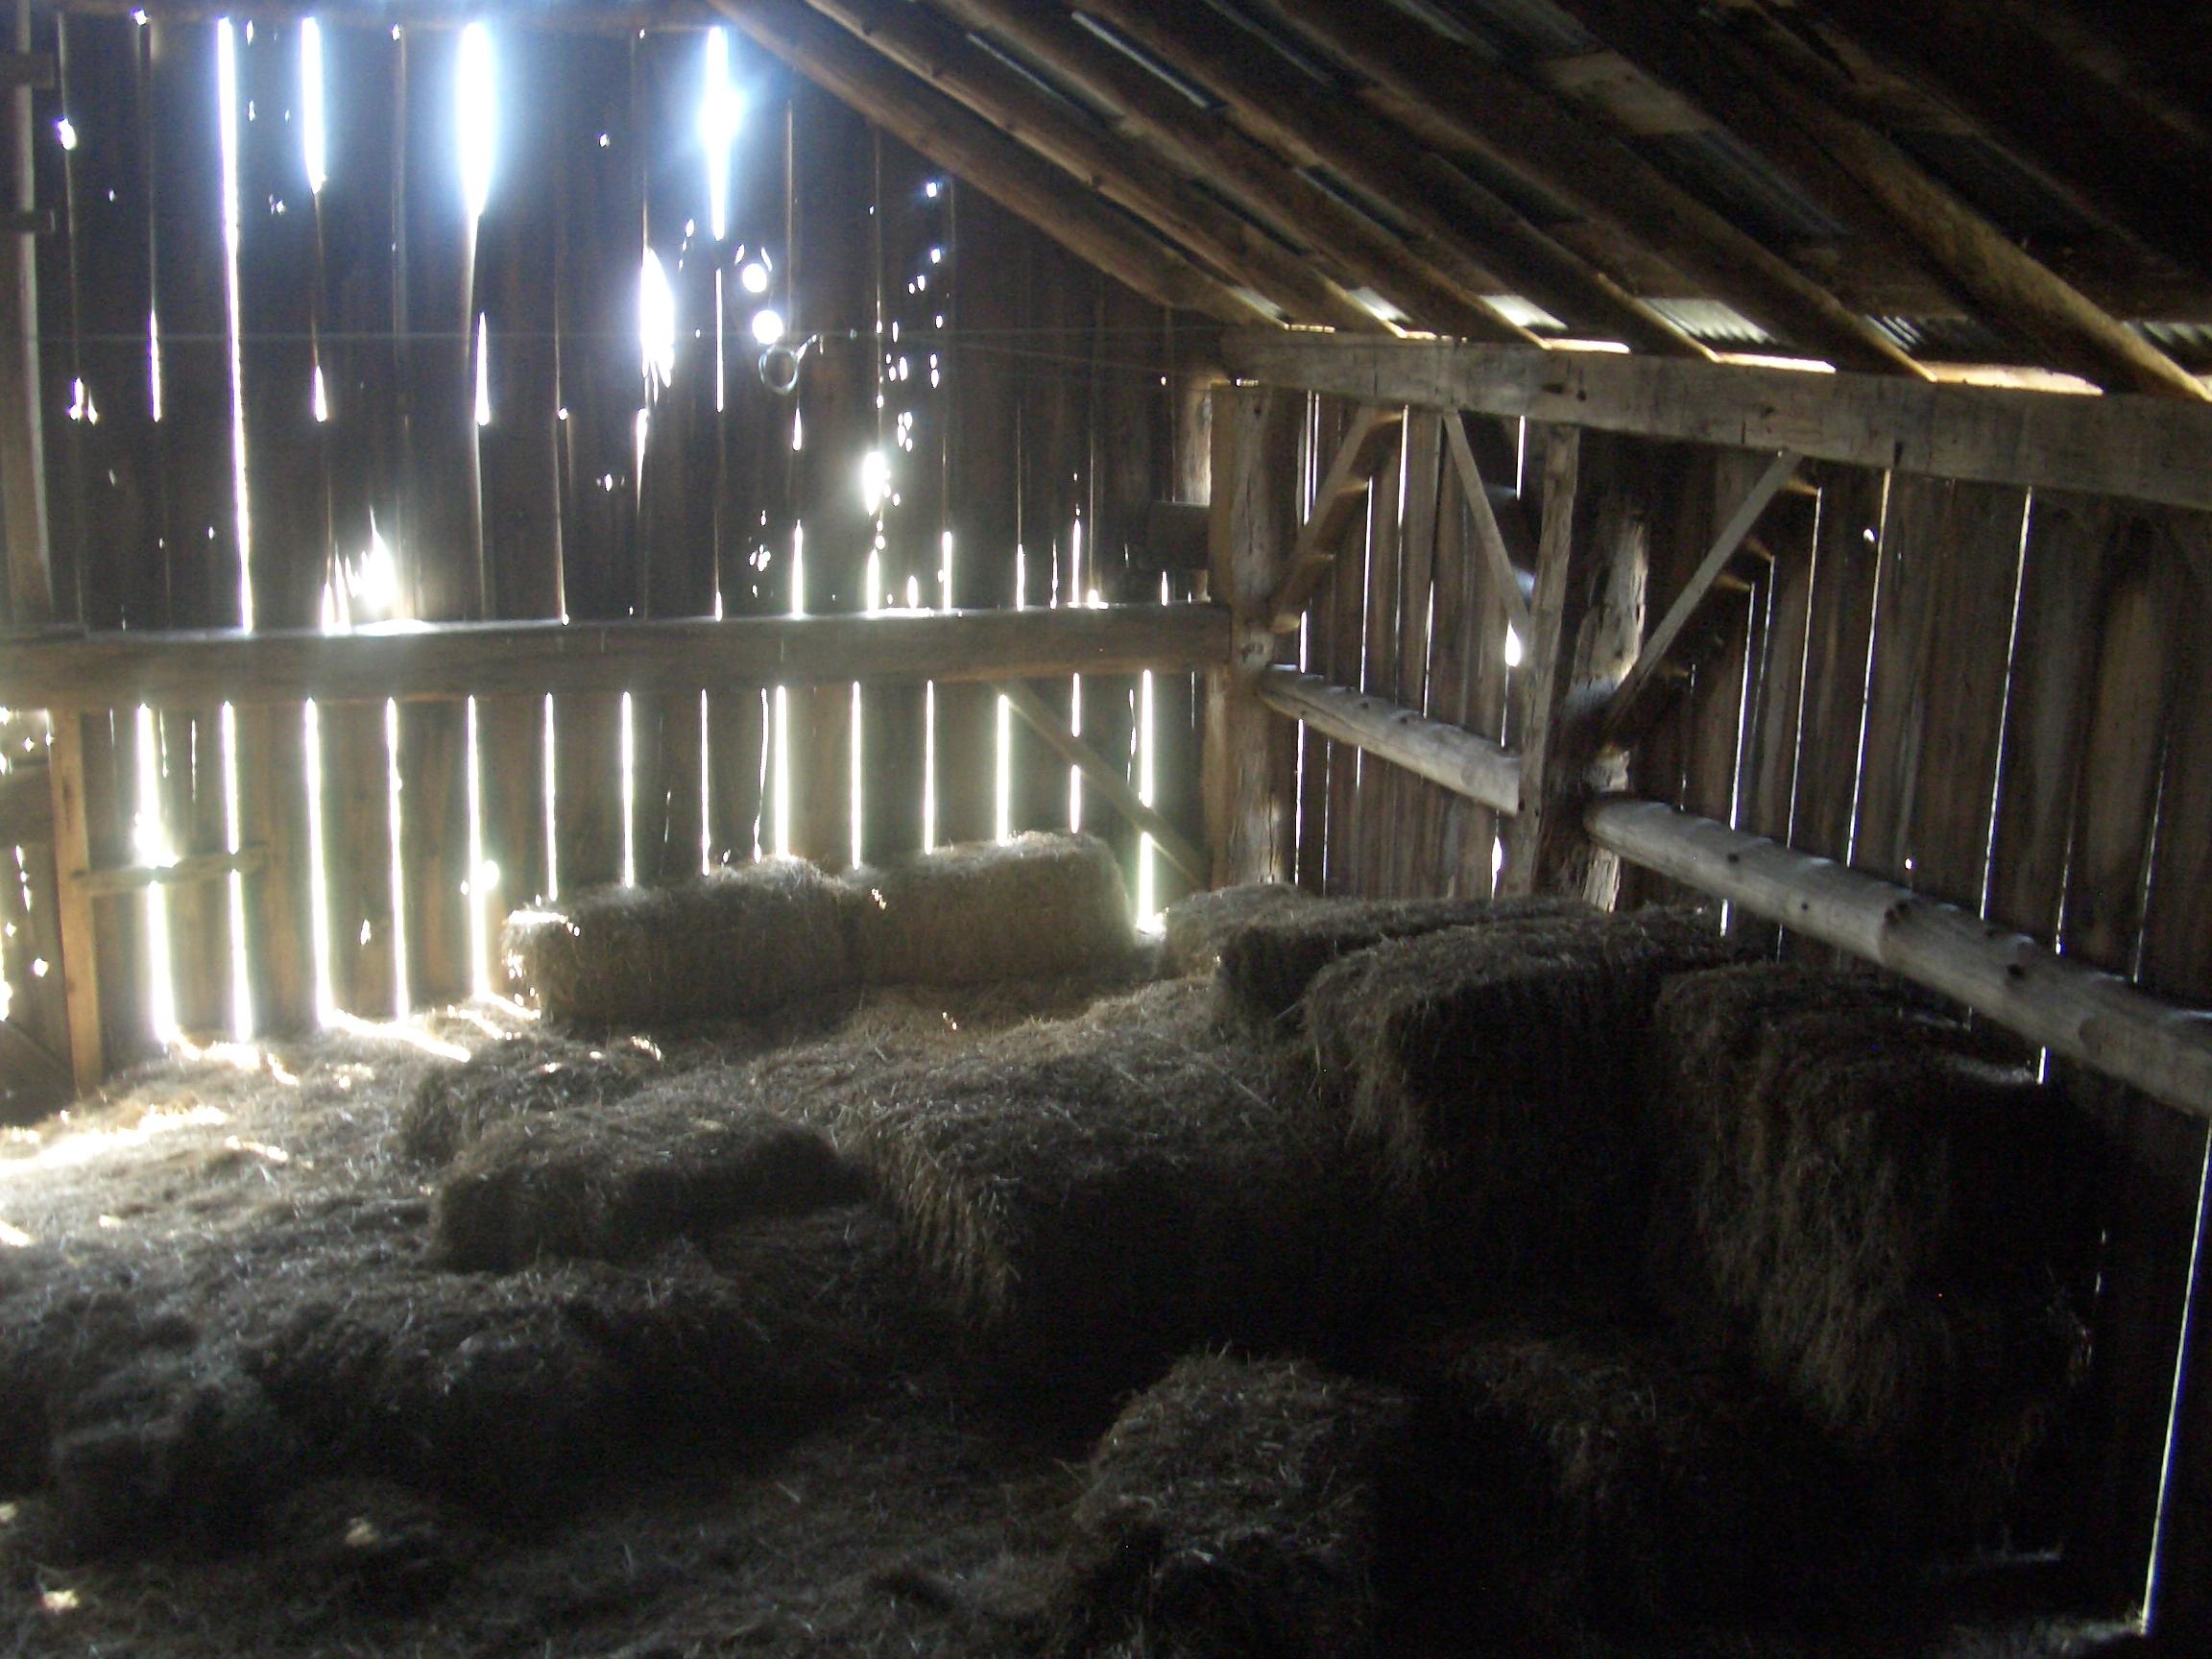 Inside an old barn 7 [image 500x375 pixels] 2304x1728